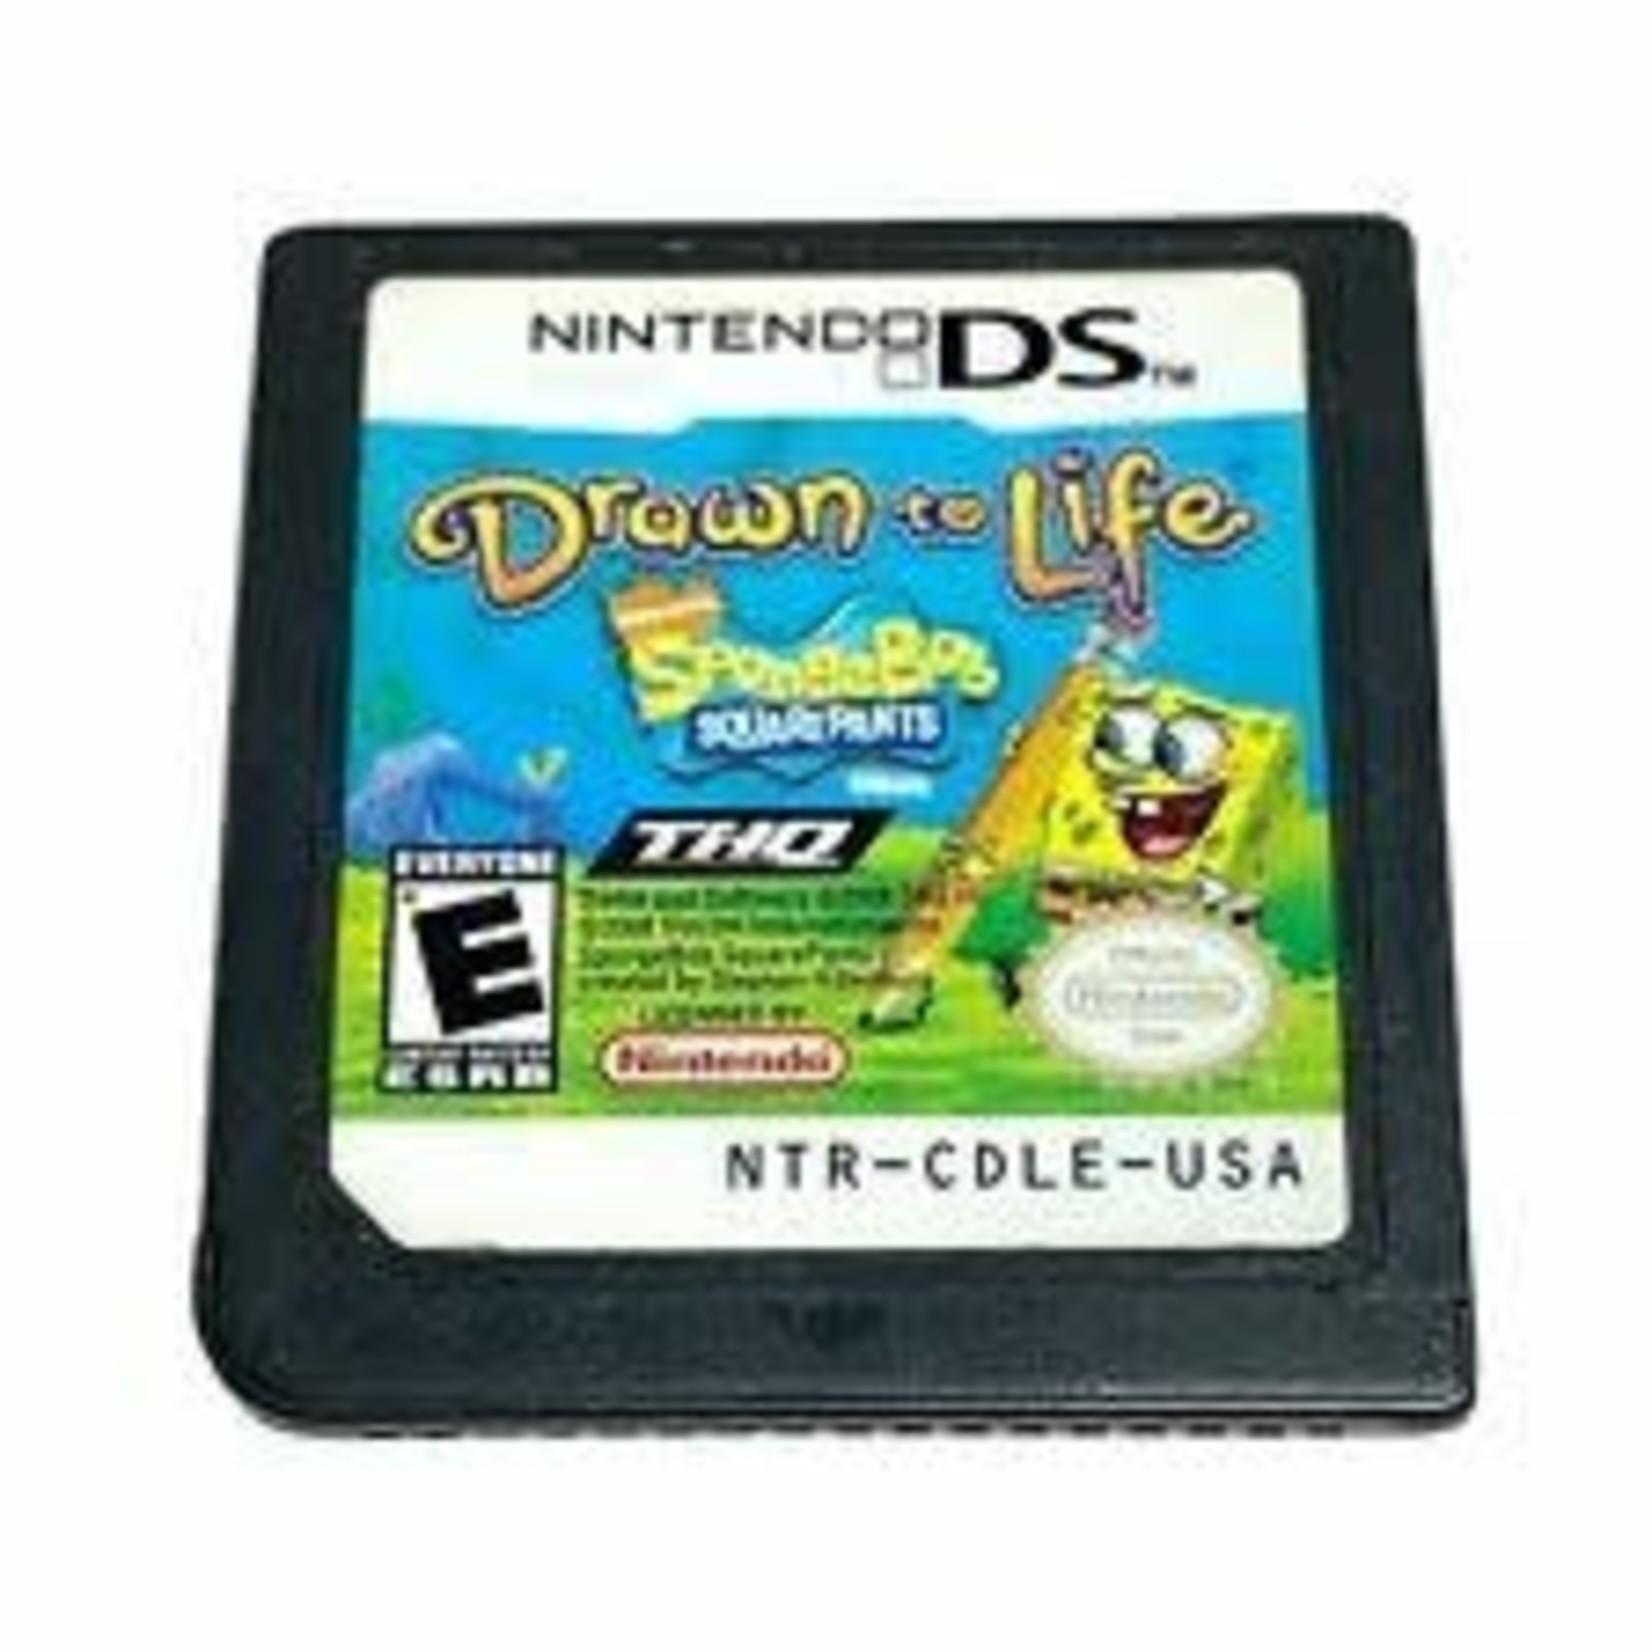 DSU-Drawn to Life Spongebob Squarepants (chip only)